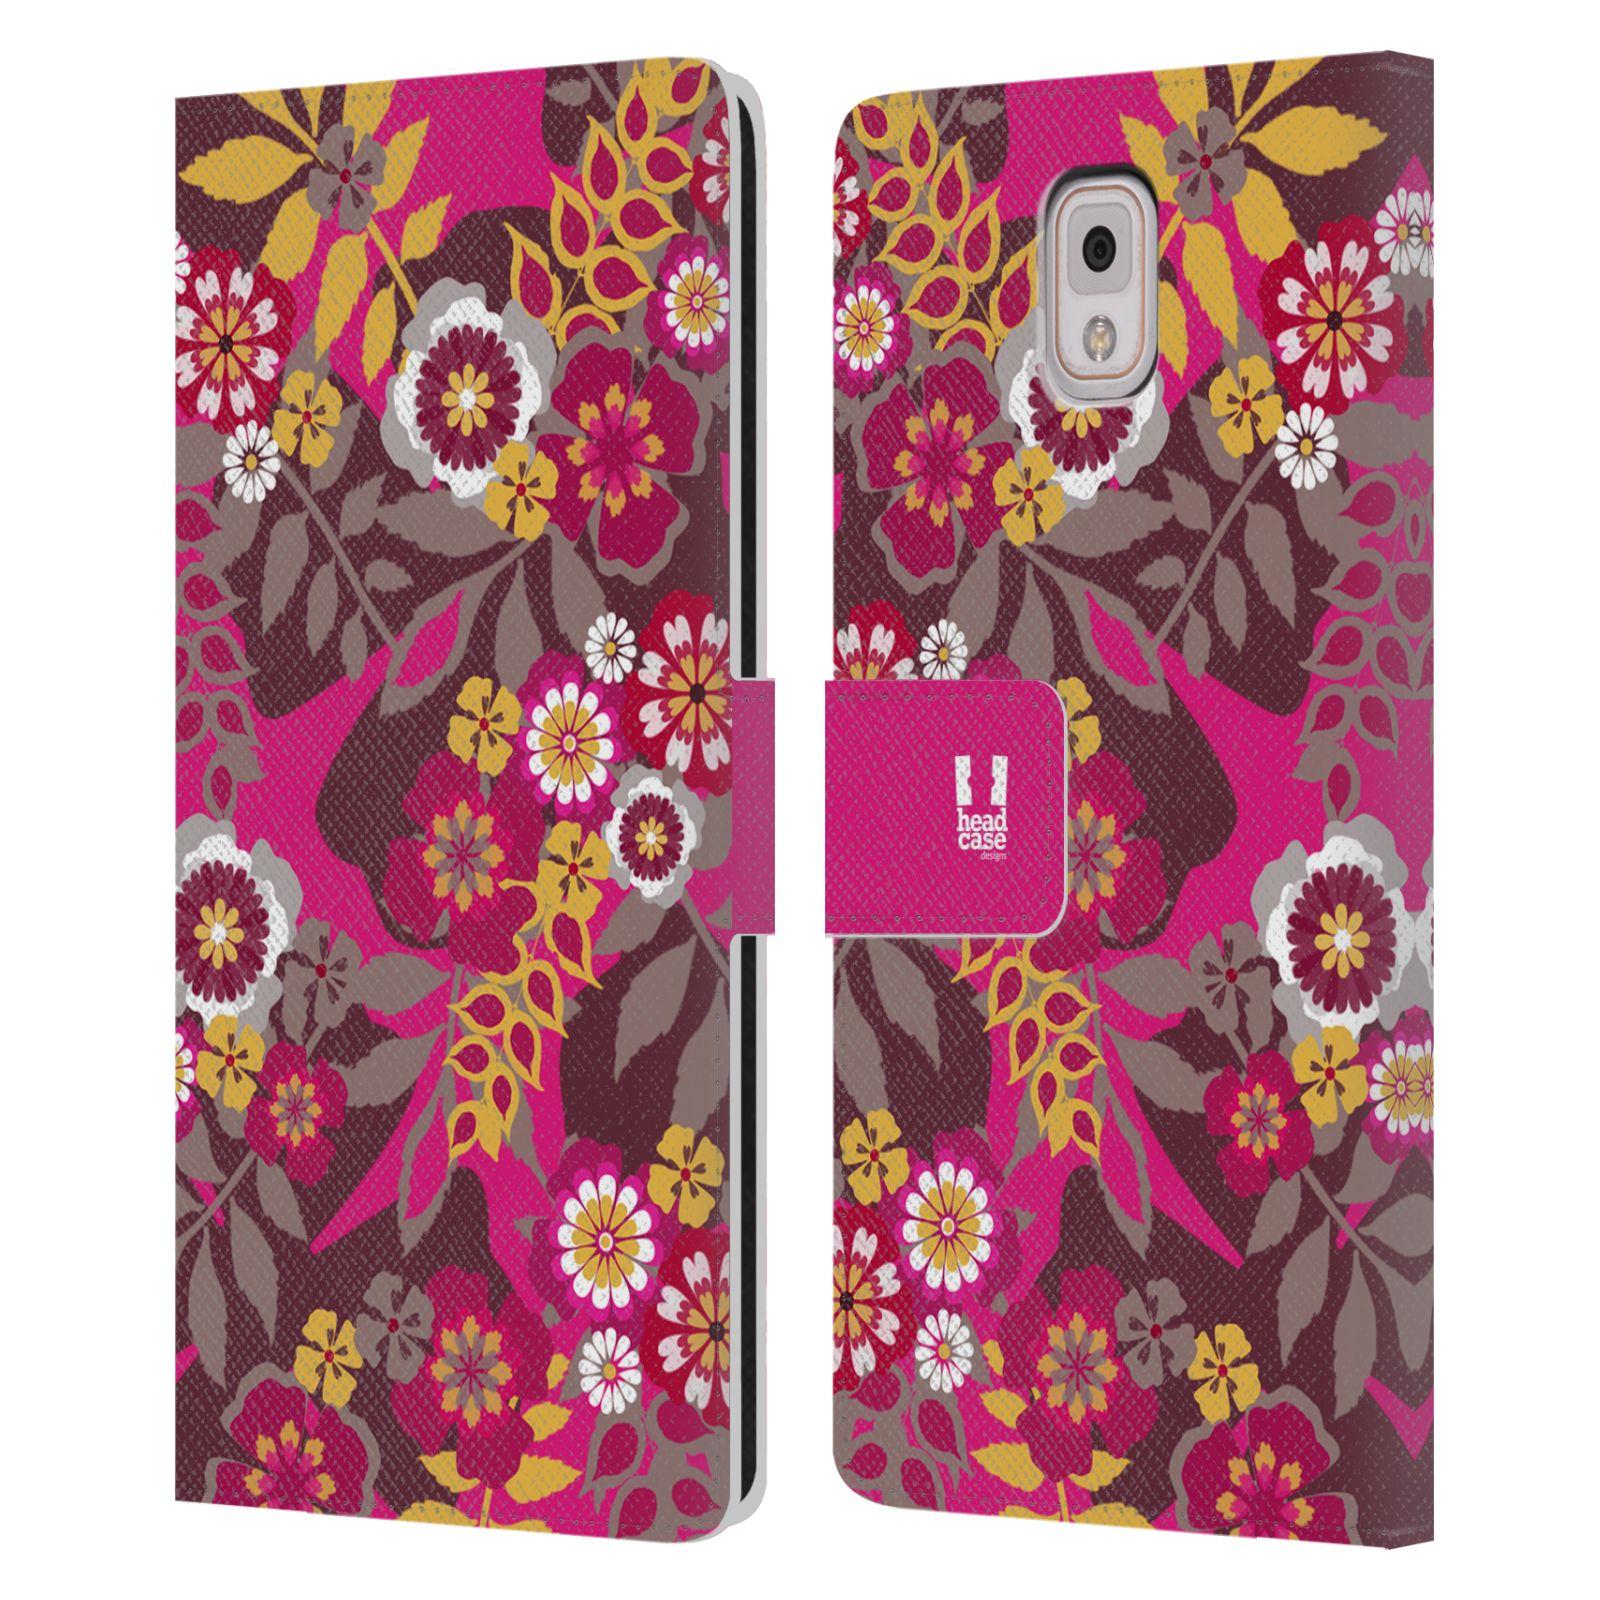 HEAD CASE Flipové pouzdro pro mobil Samsung Galaxy Note 3 N9005 BOTANIKA růžová a hnědá